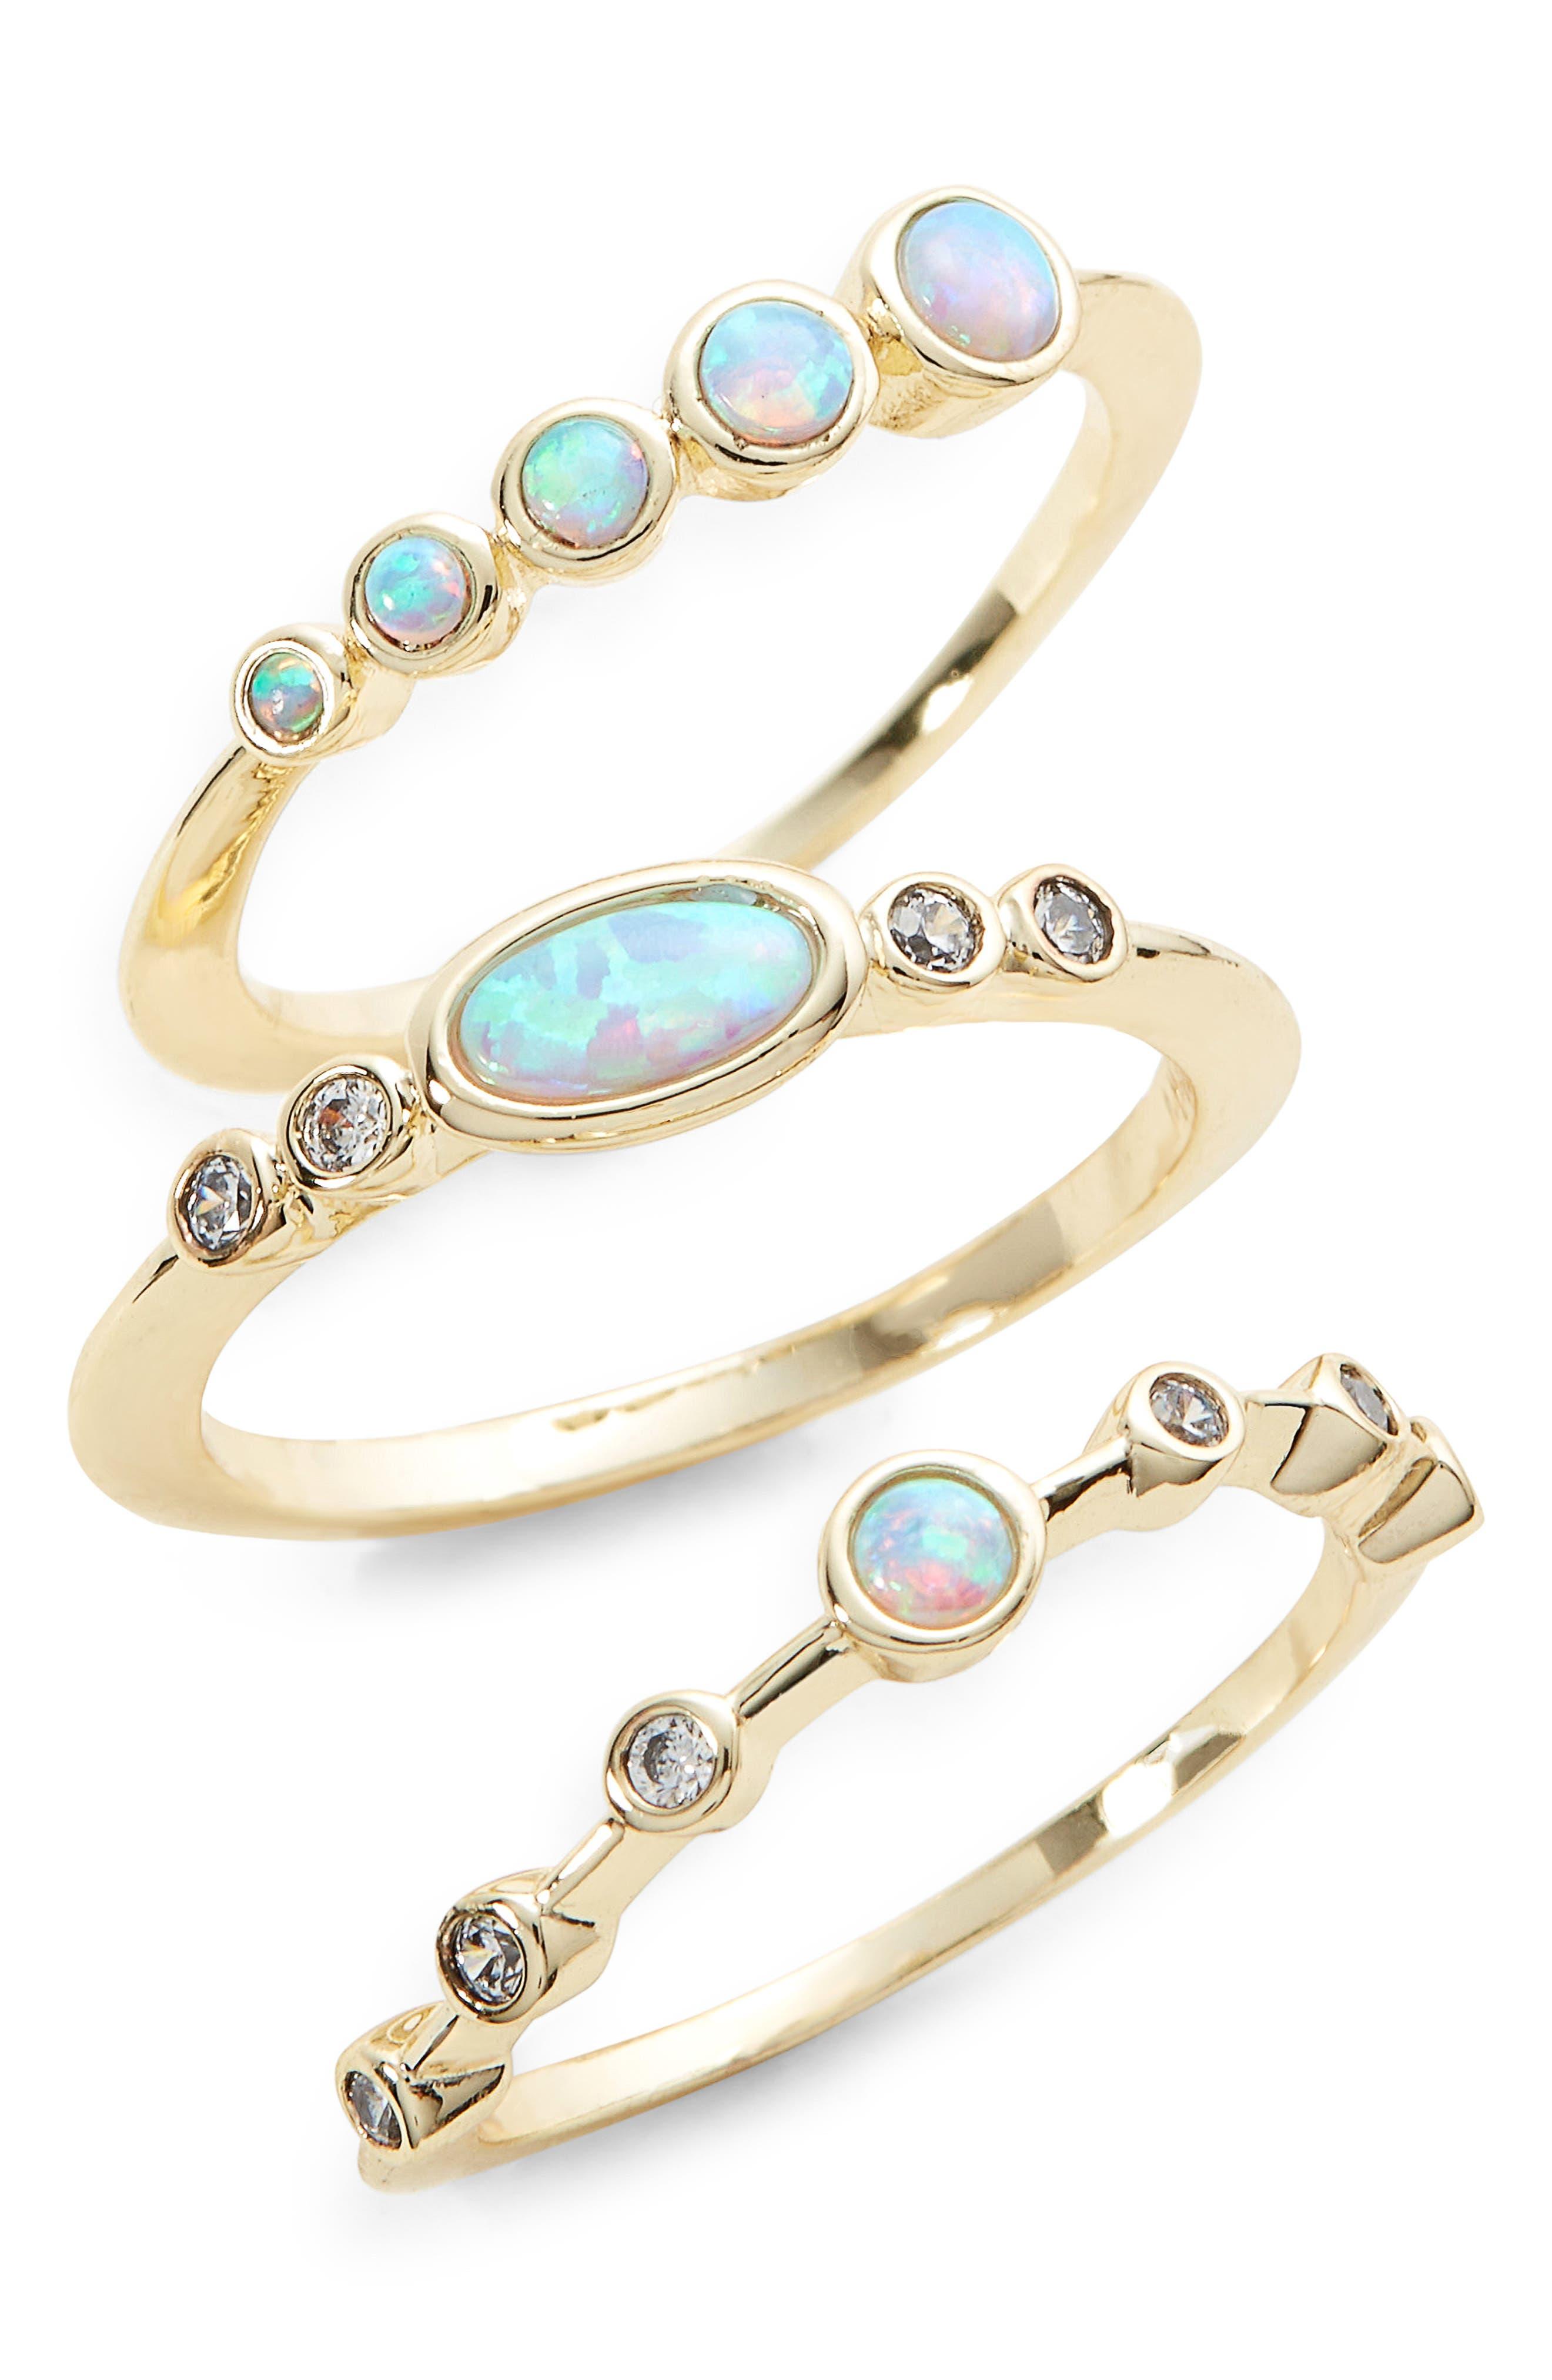 Monet Set of Three Opal Stacking Rings,                             Main thumbnail 1, color,                             Opal/ Crystal